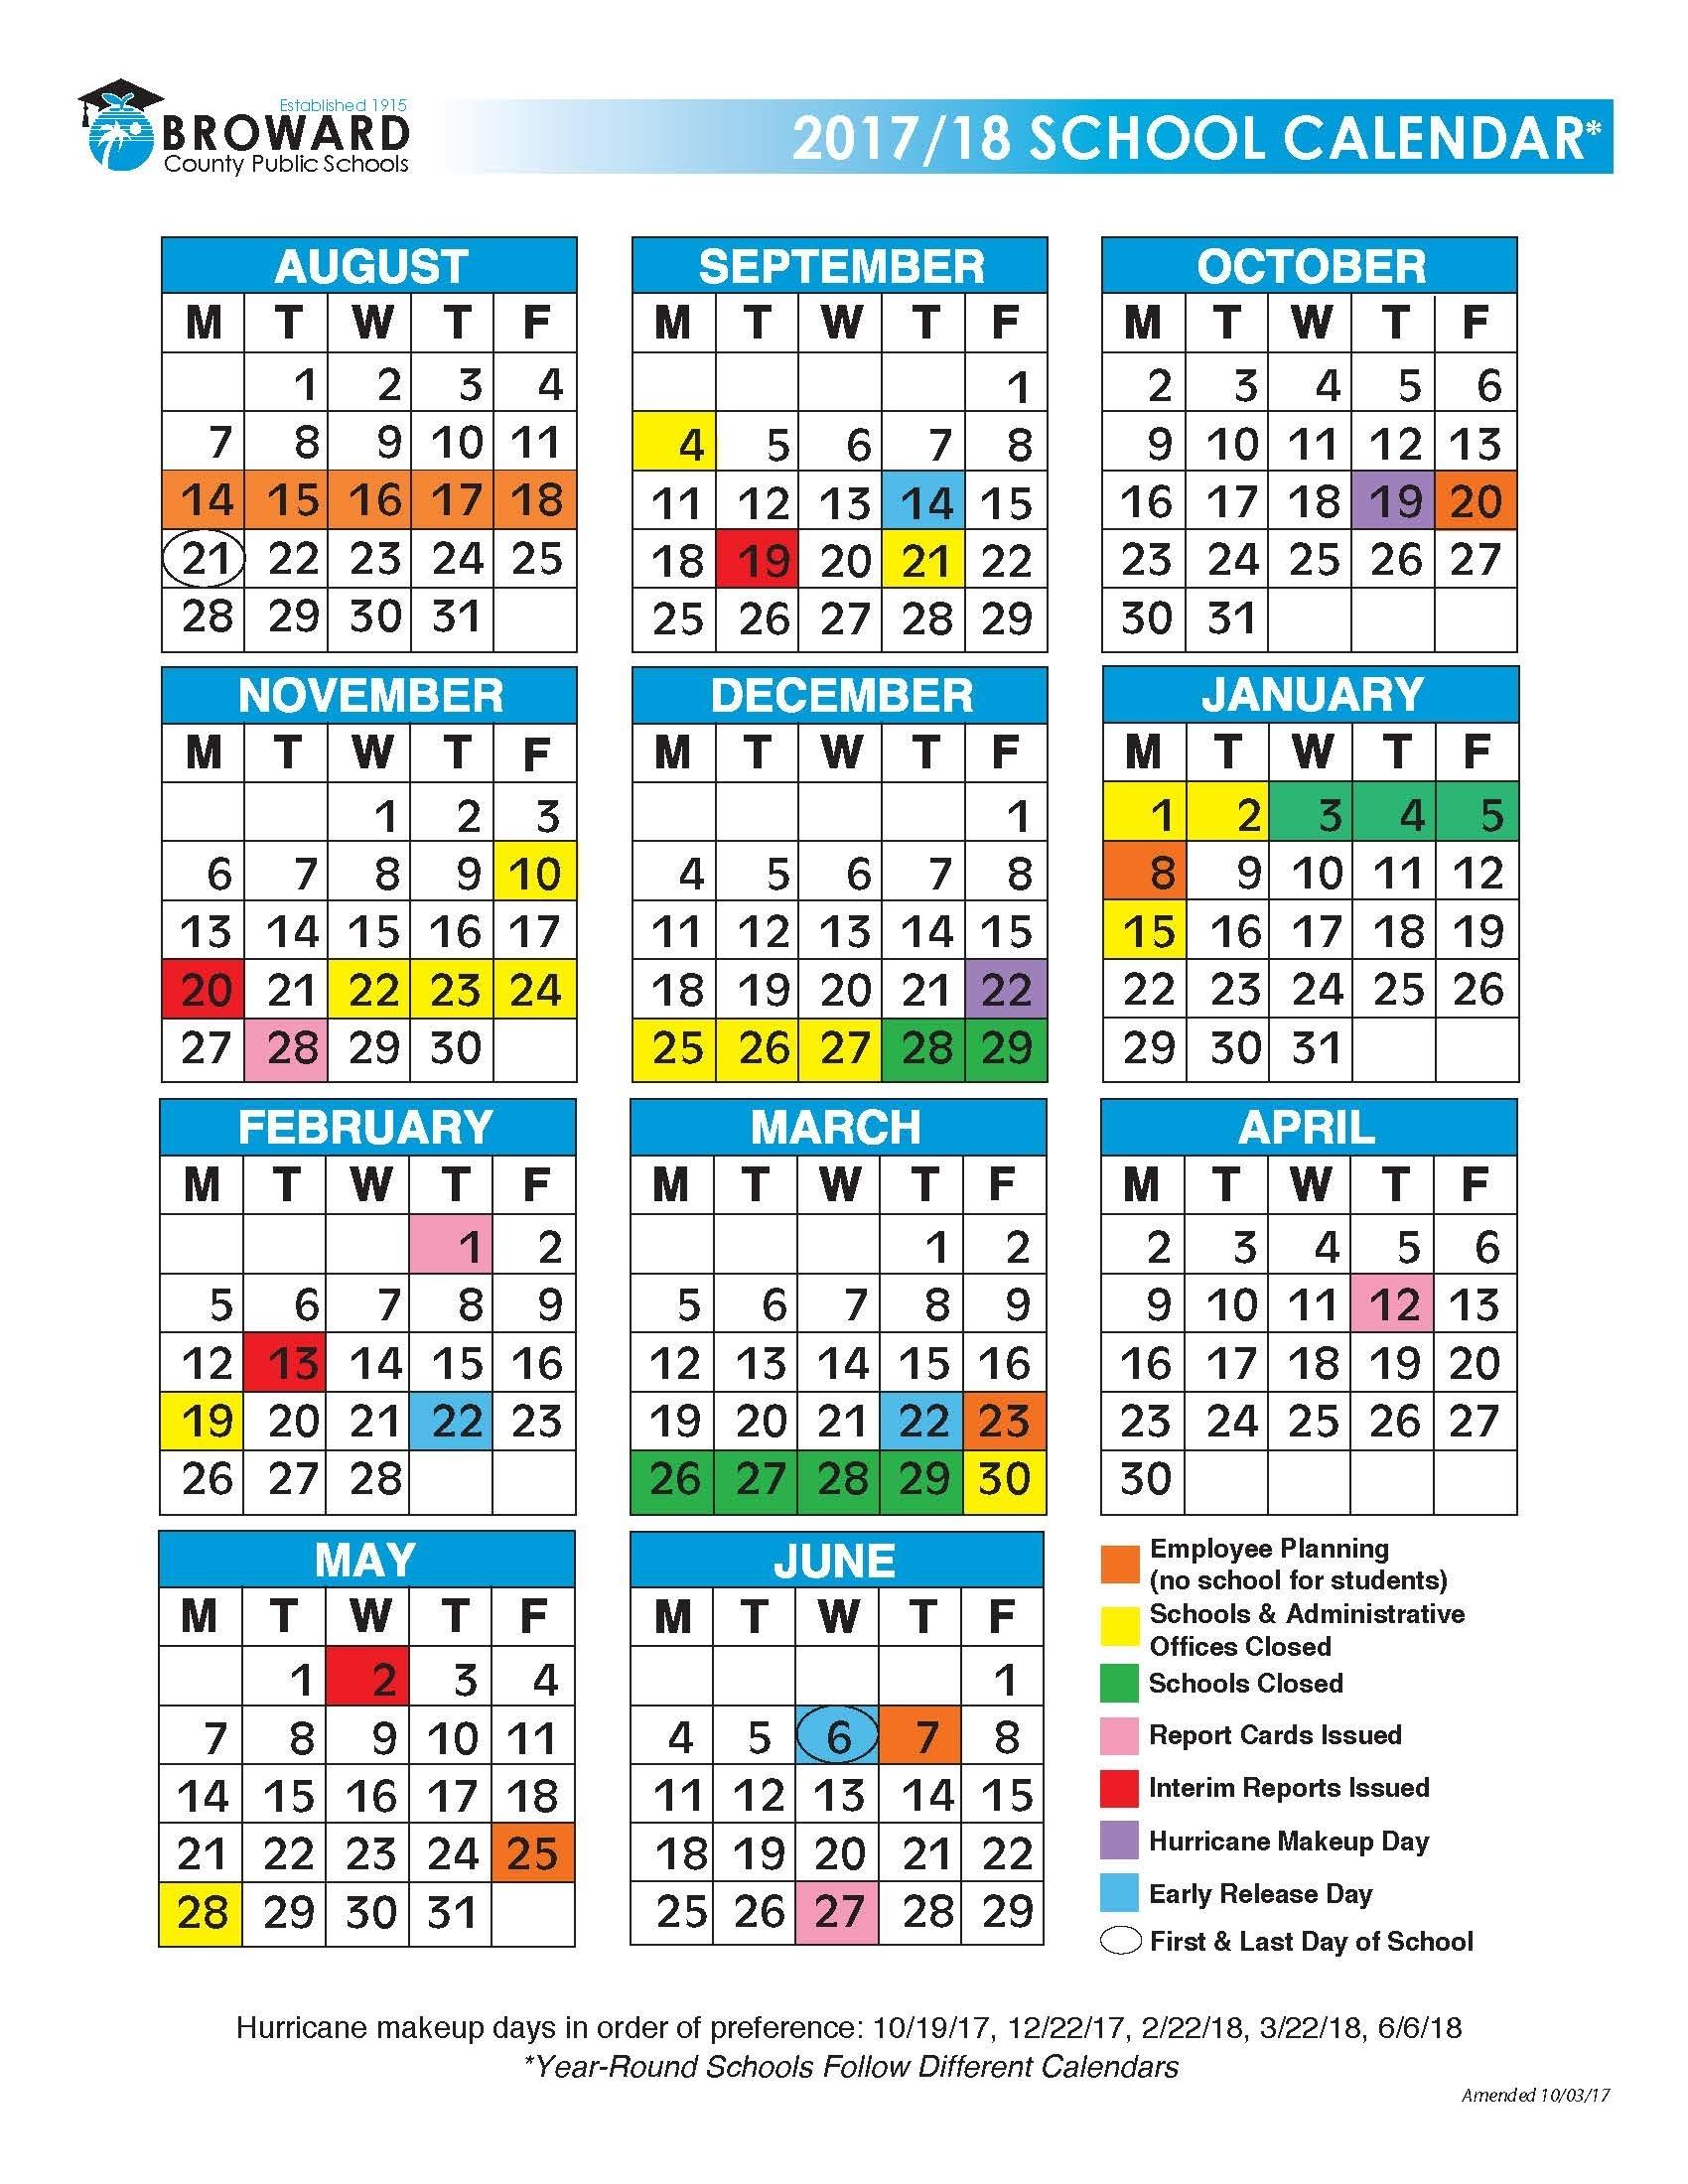 Broward County School Calendar 2017 2018   Printable Monthly Impressive Broward County School Calendar